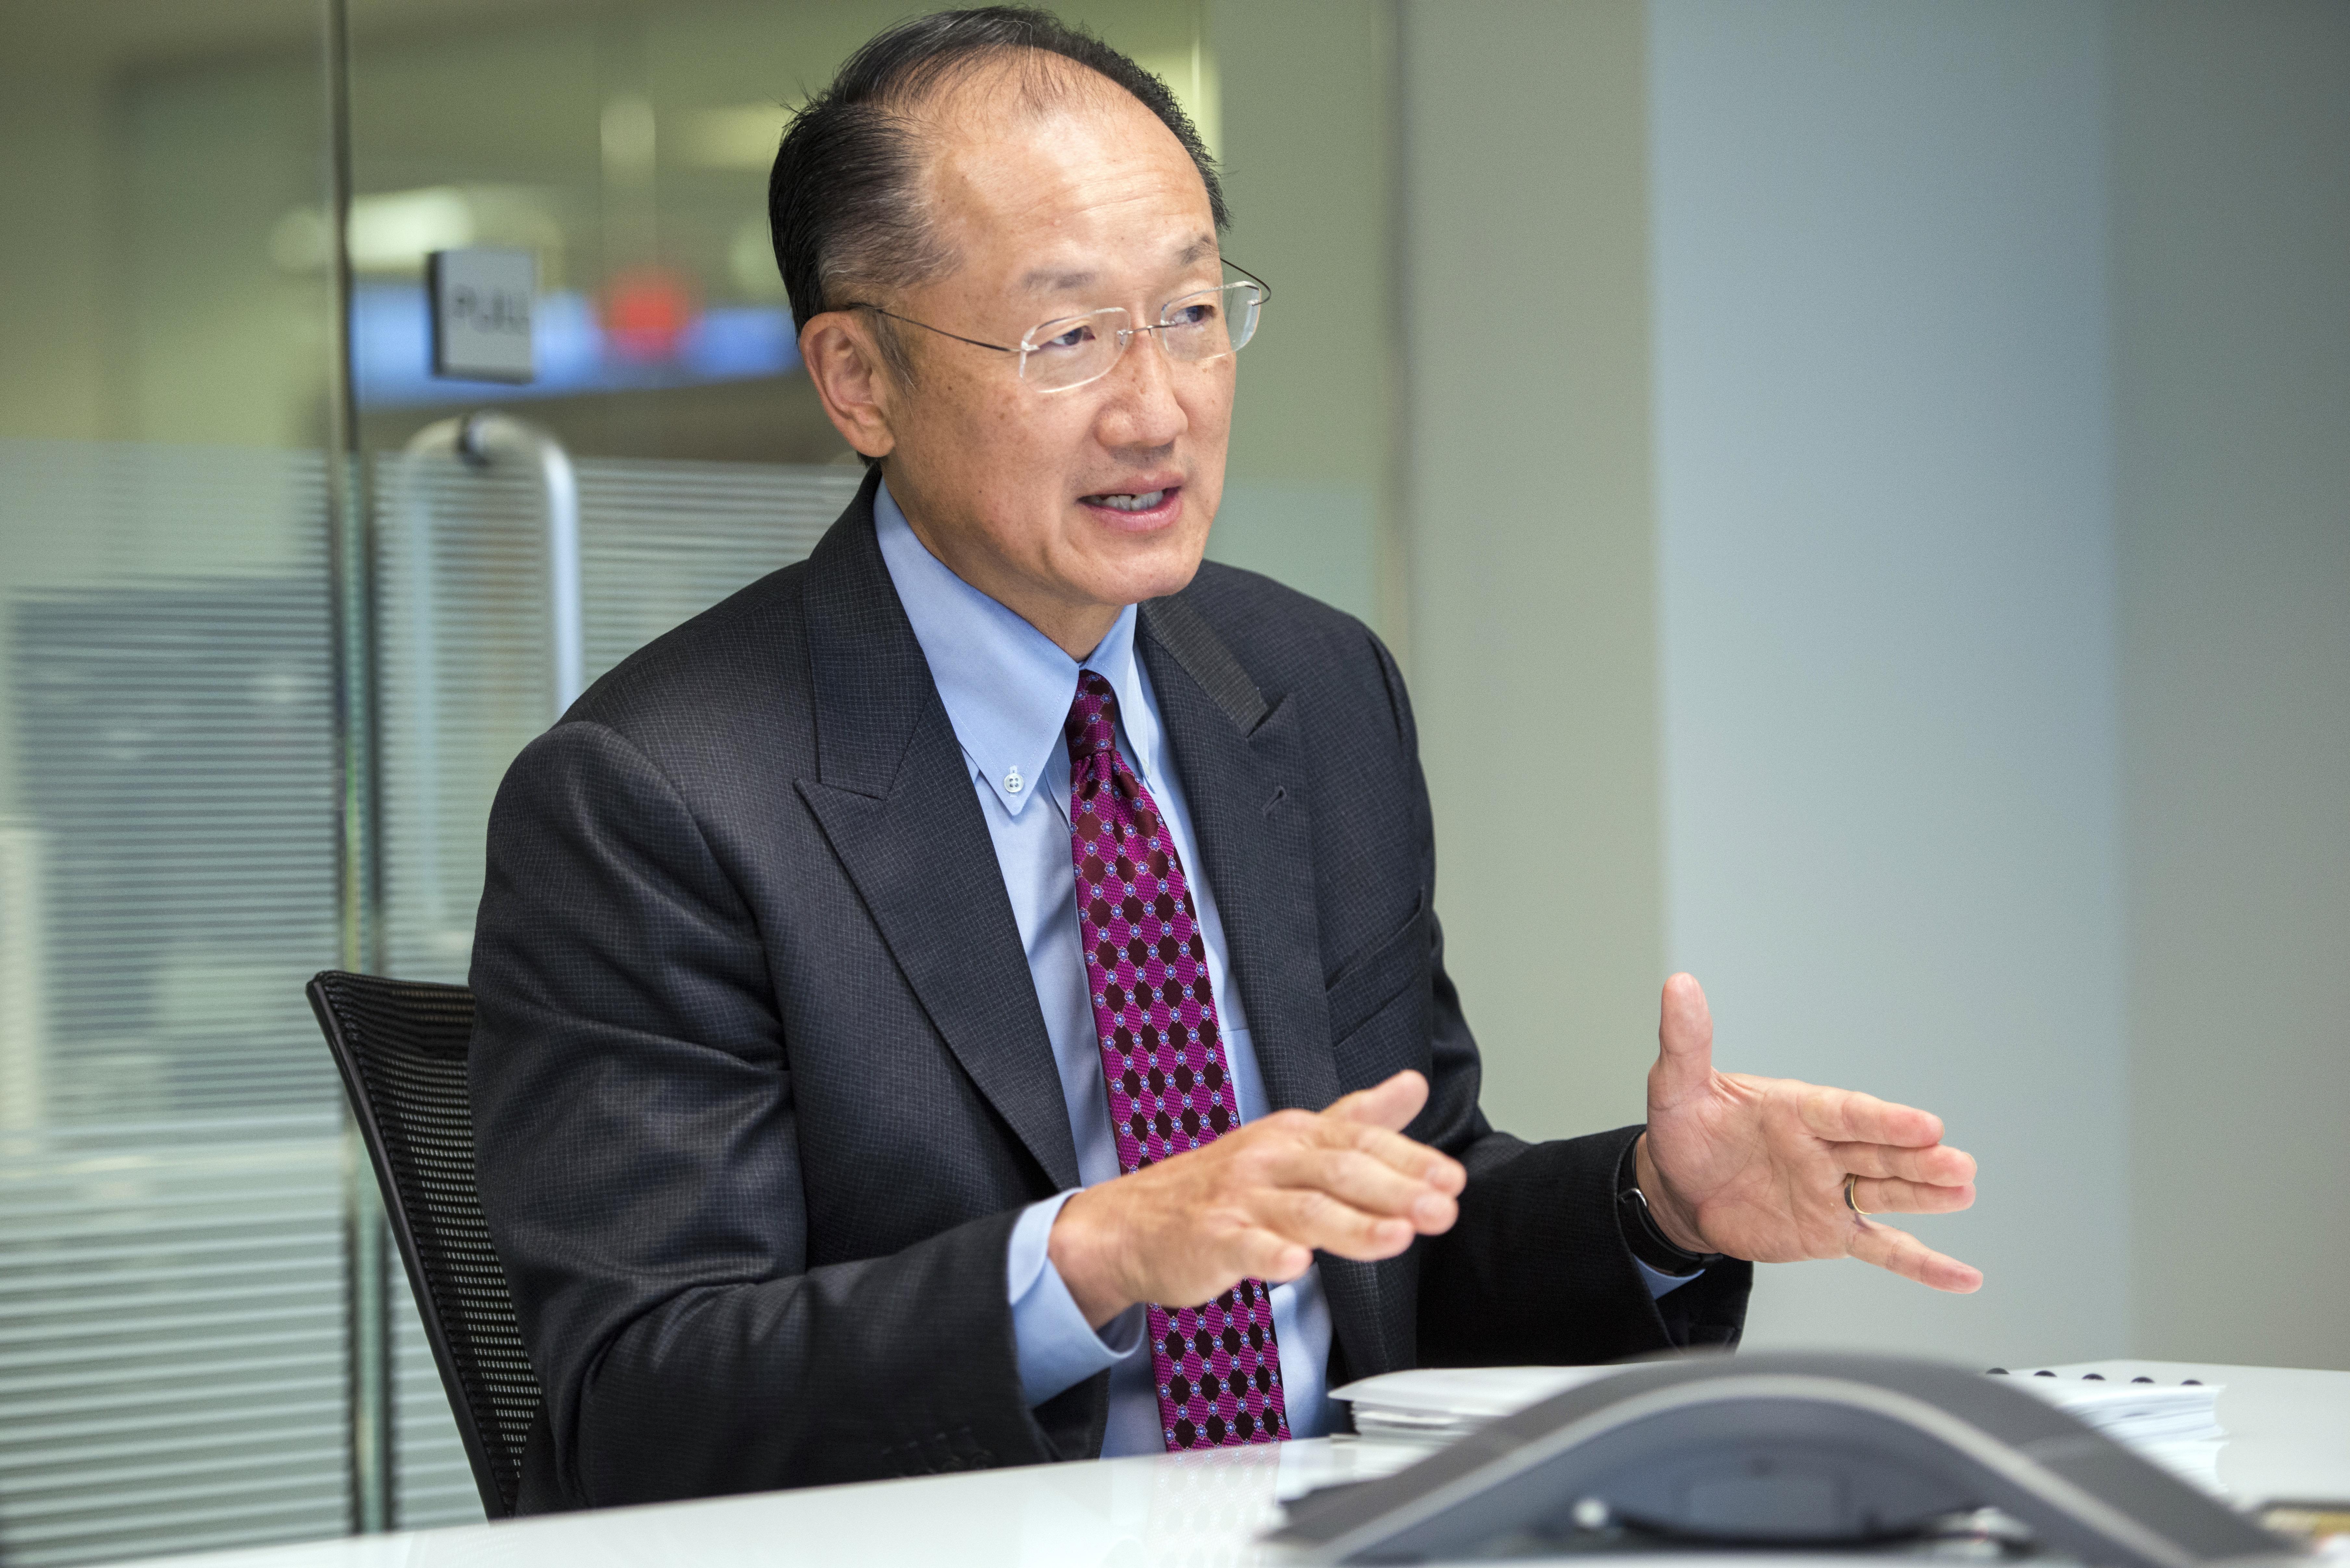 Džim Jong Kim želi drugi mandat na čelu Svjetske banke